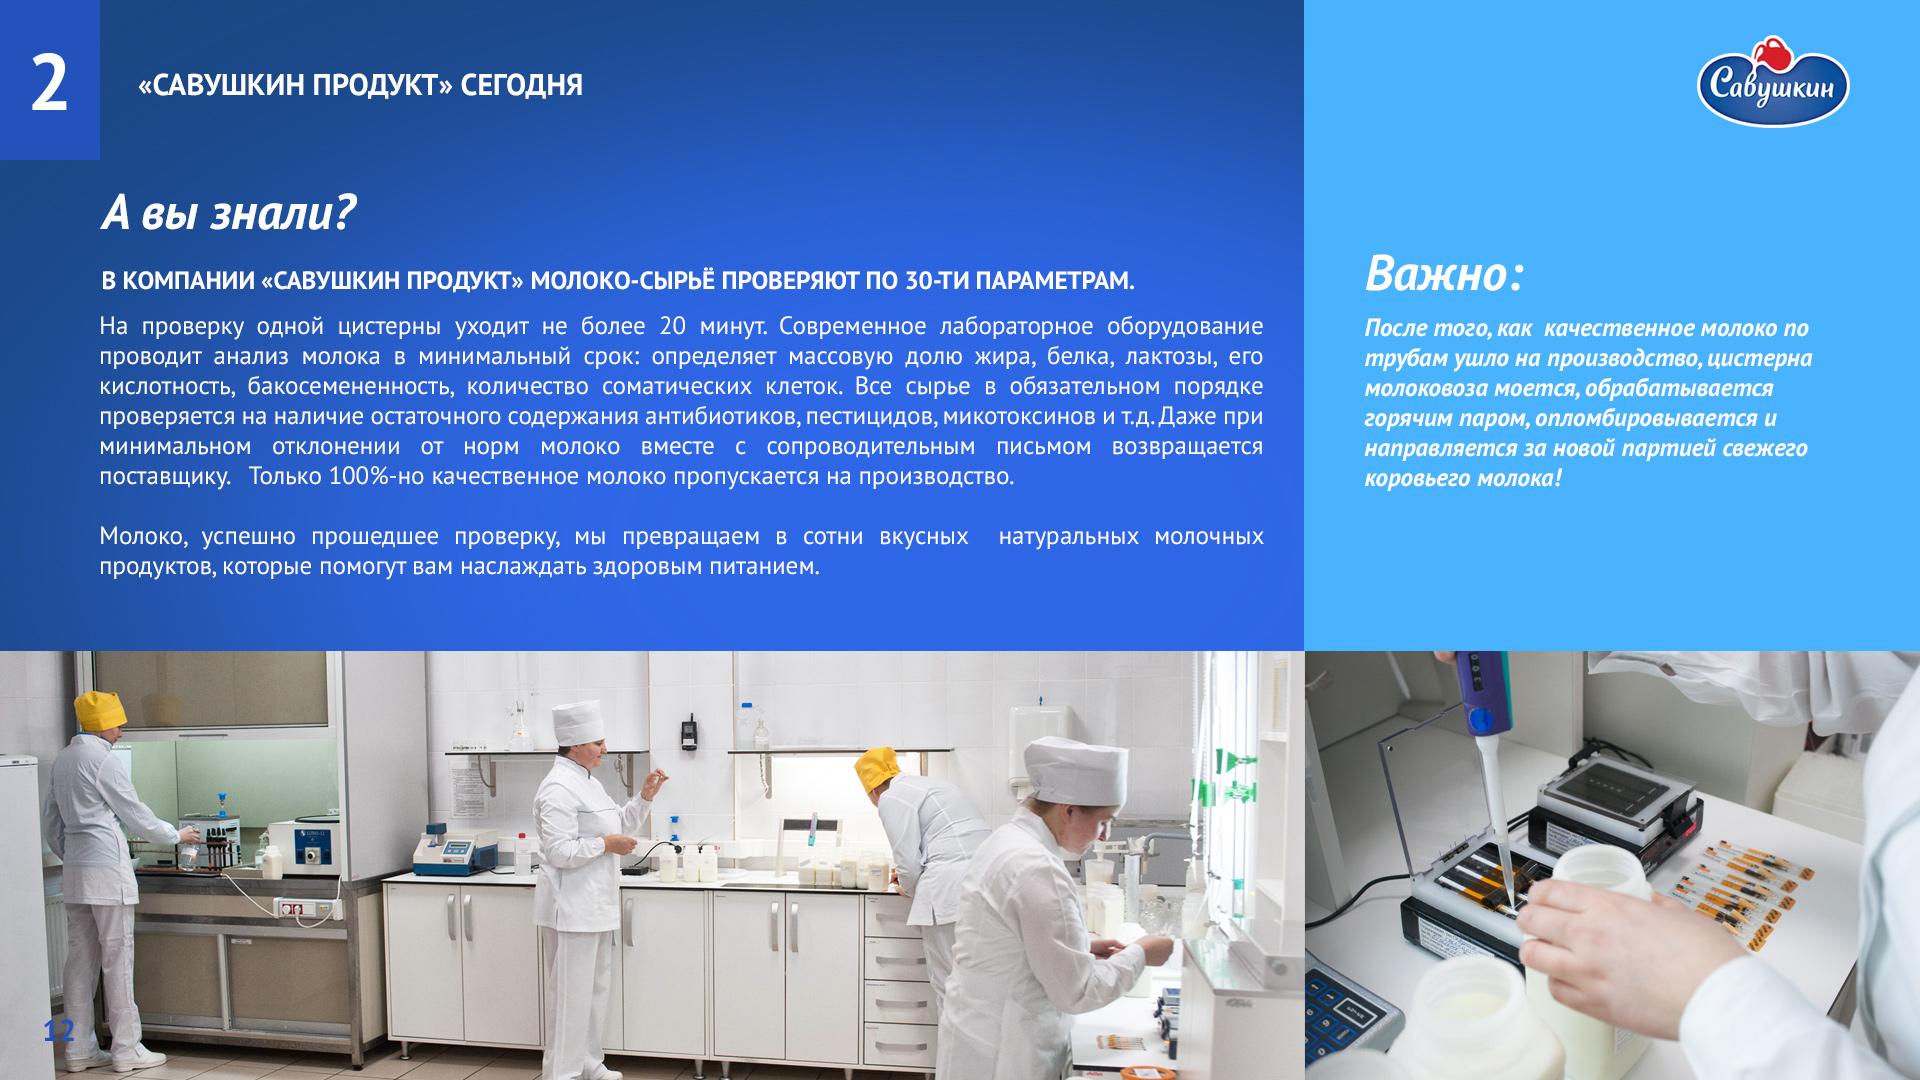 Savushkin_product_report-6